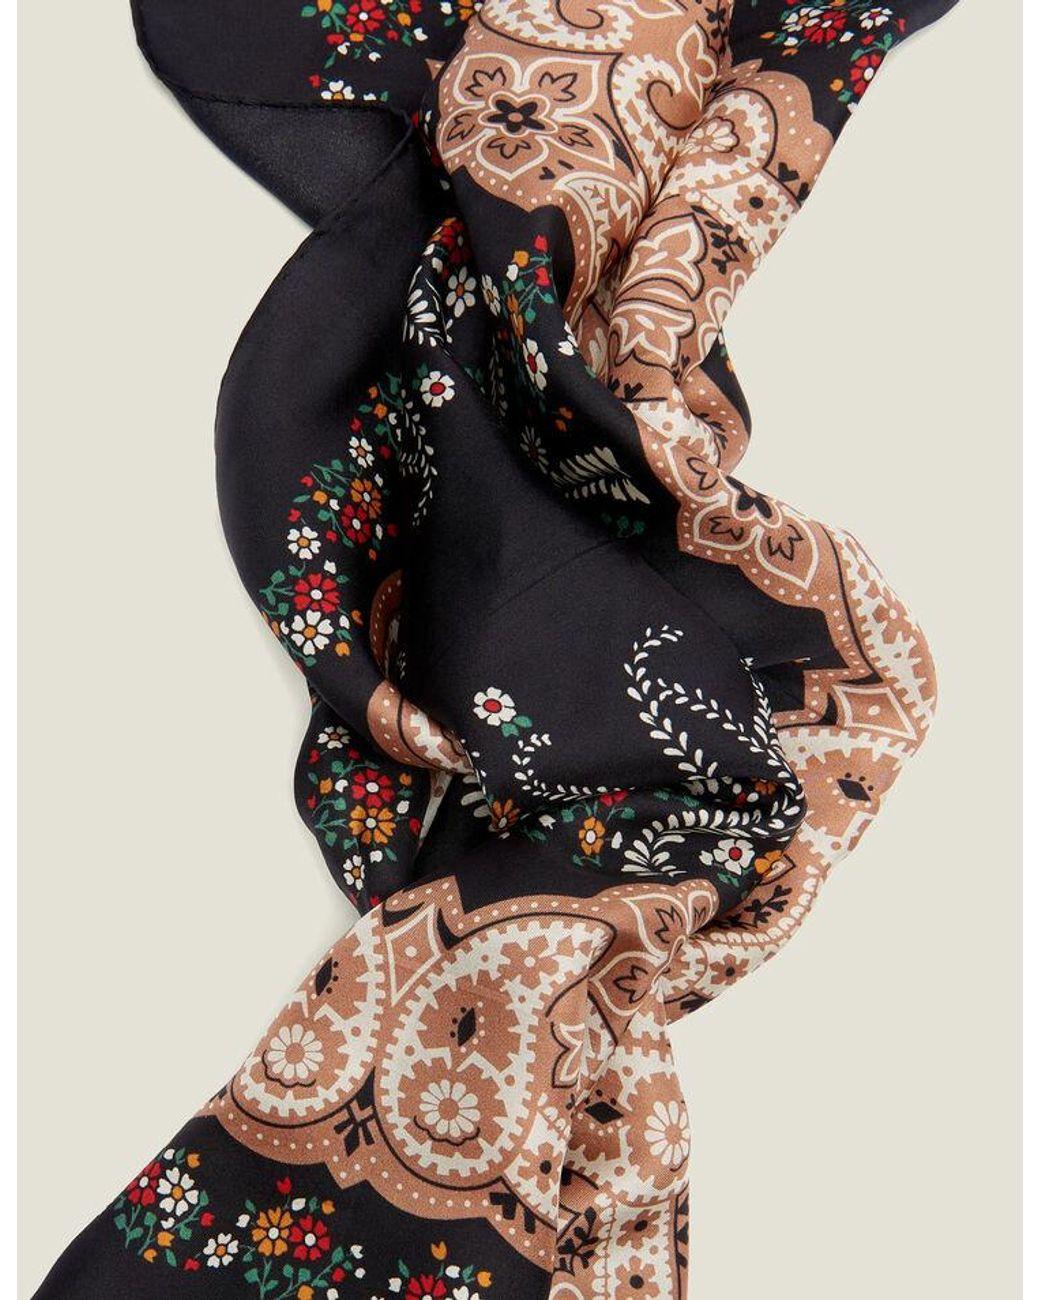 Genuine Polo Ralph Lauren Garment Dyed Oversized Scarf Tie Dye Pattern $68